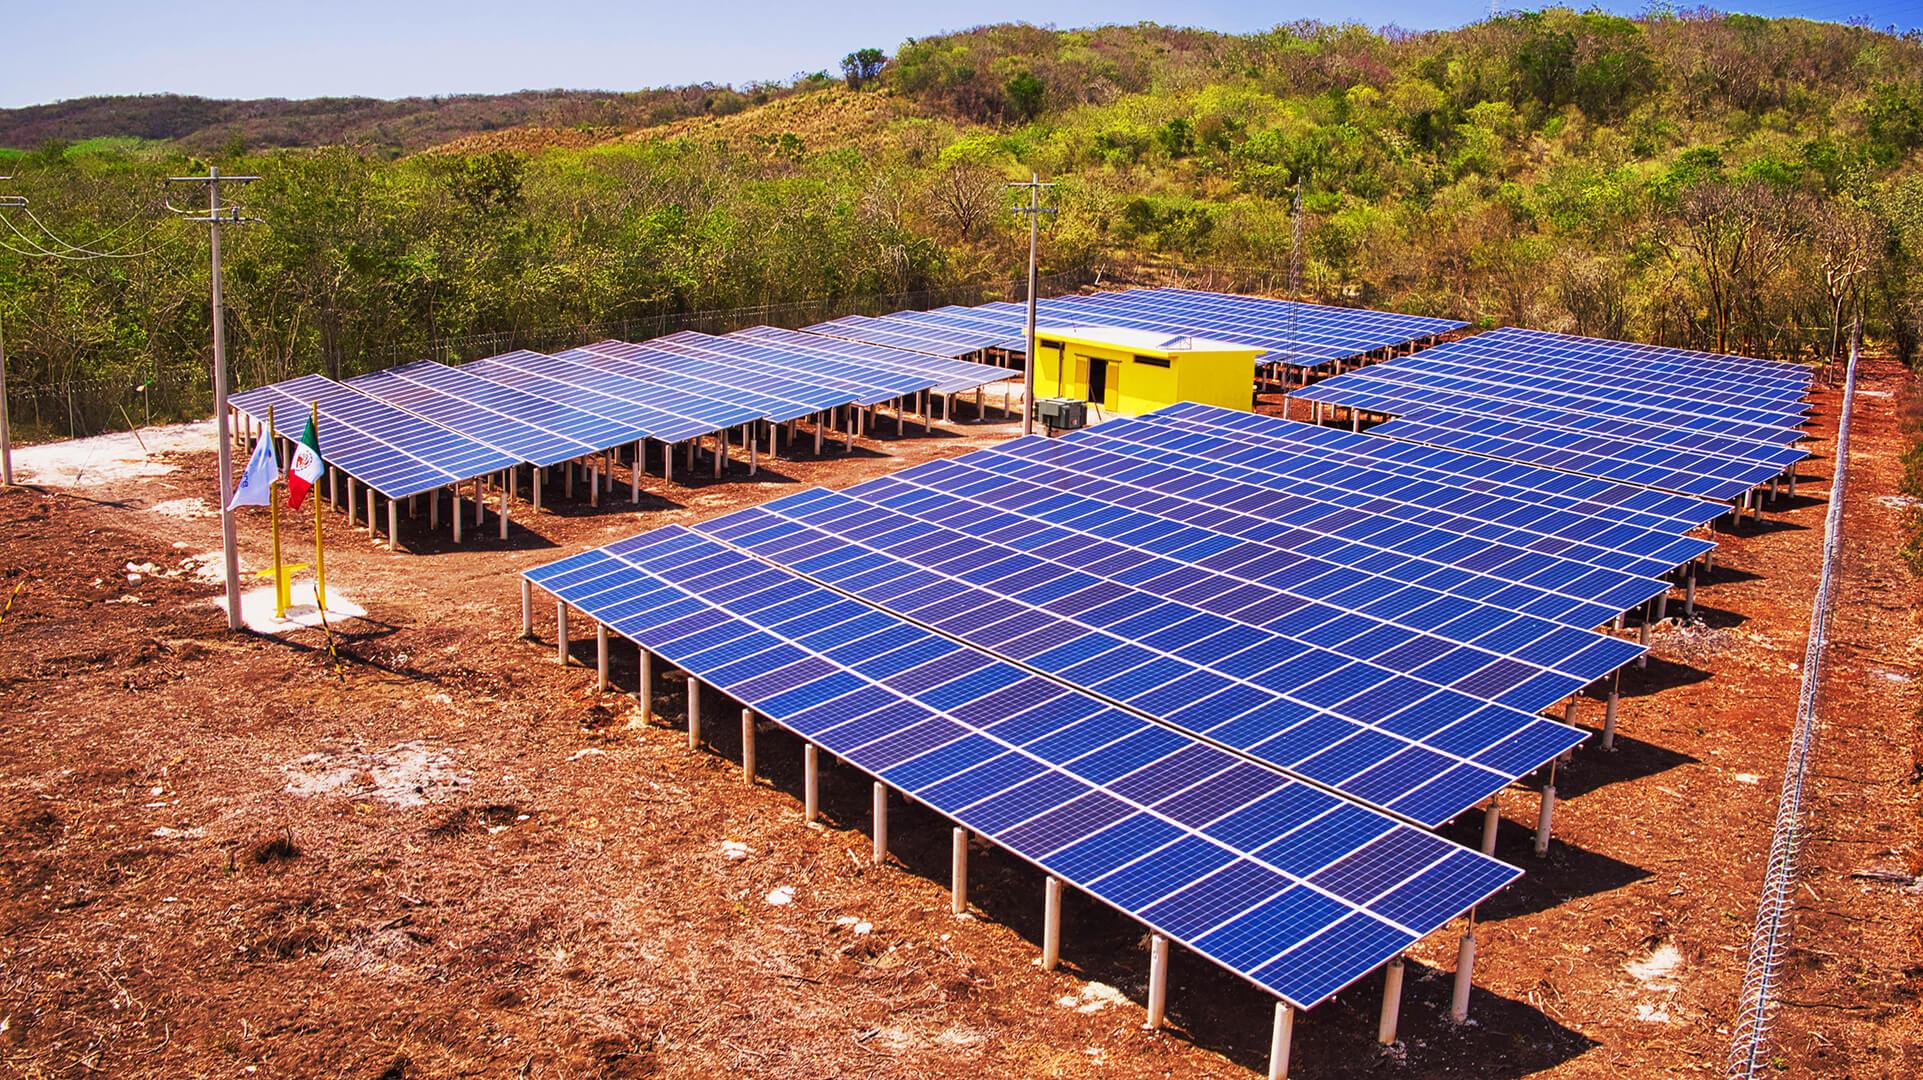 Parque Solar Chulbac